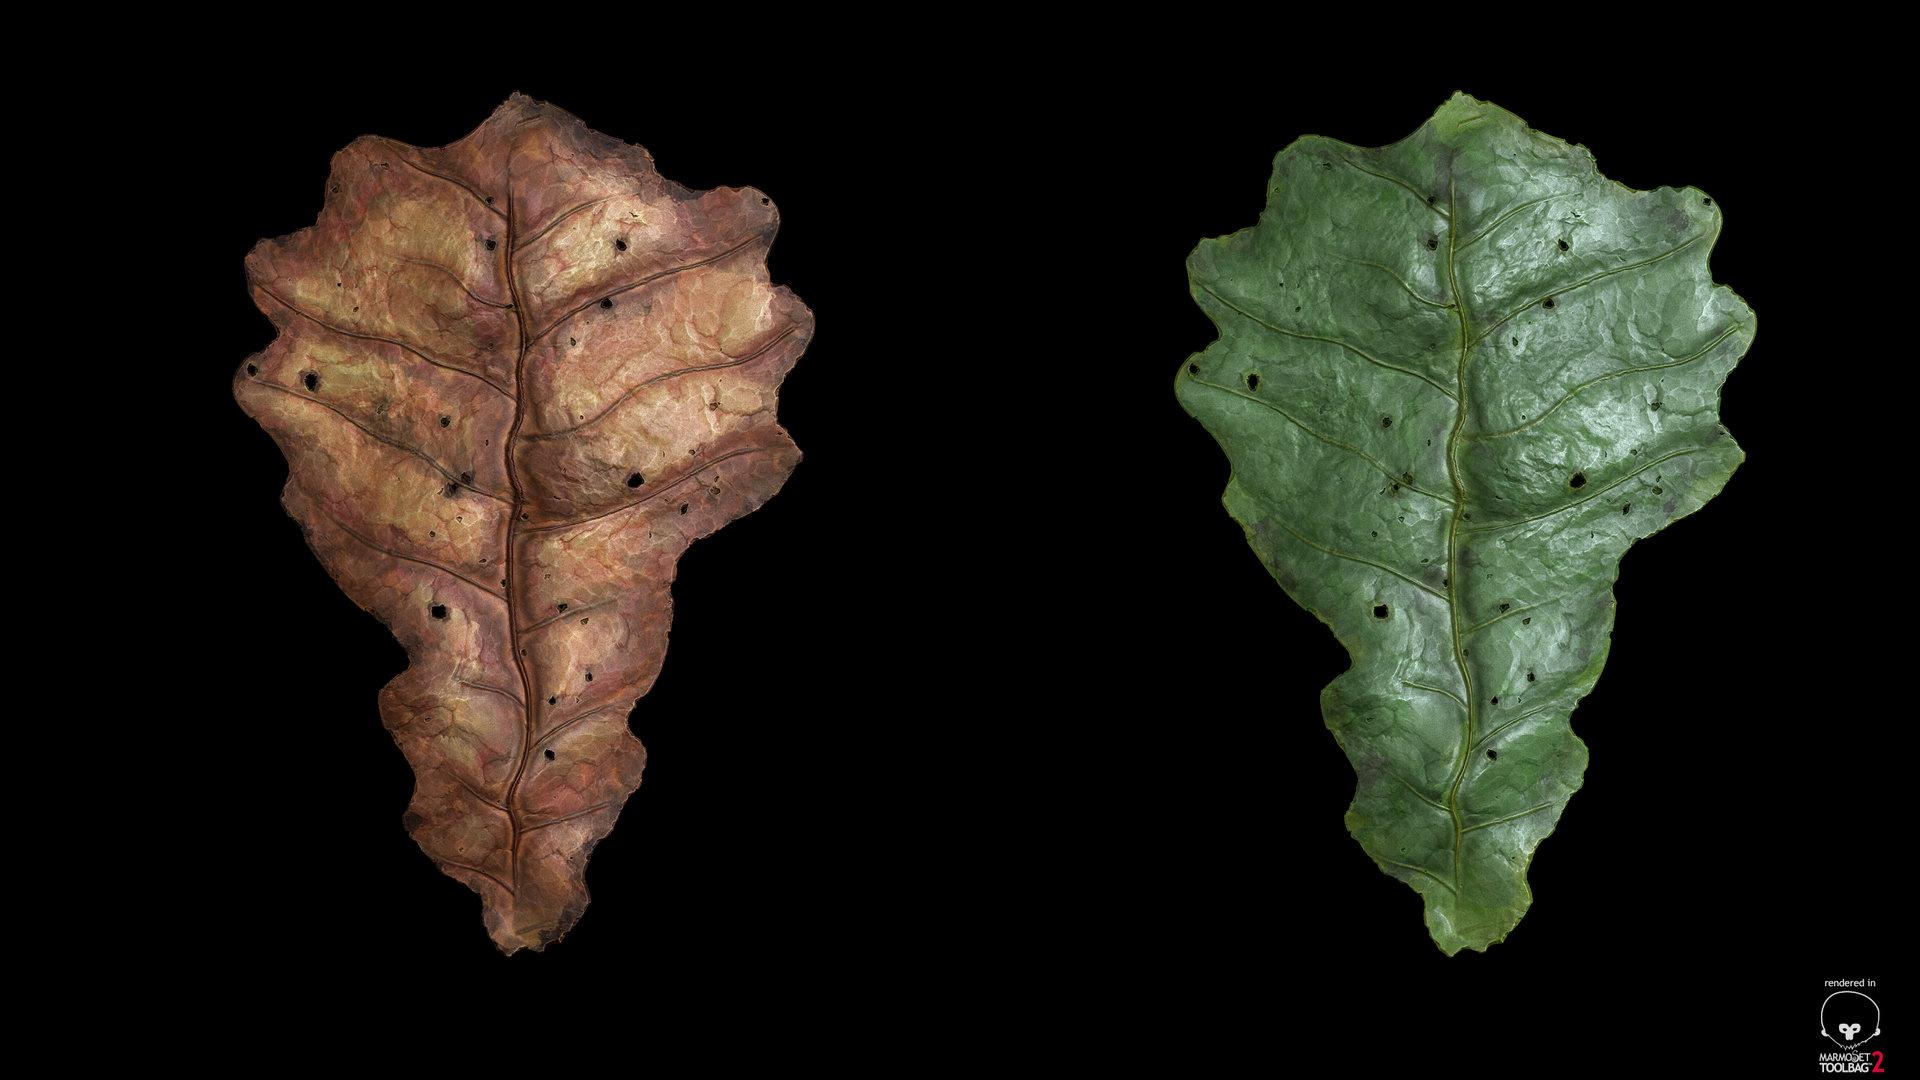 sebastian-schade-leaf2.jpg?1436909617